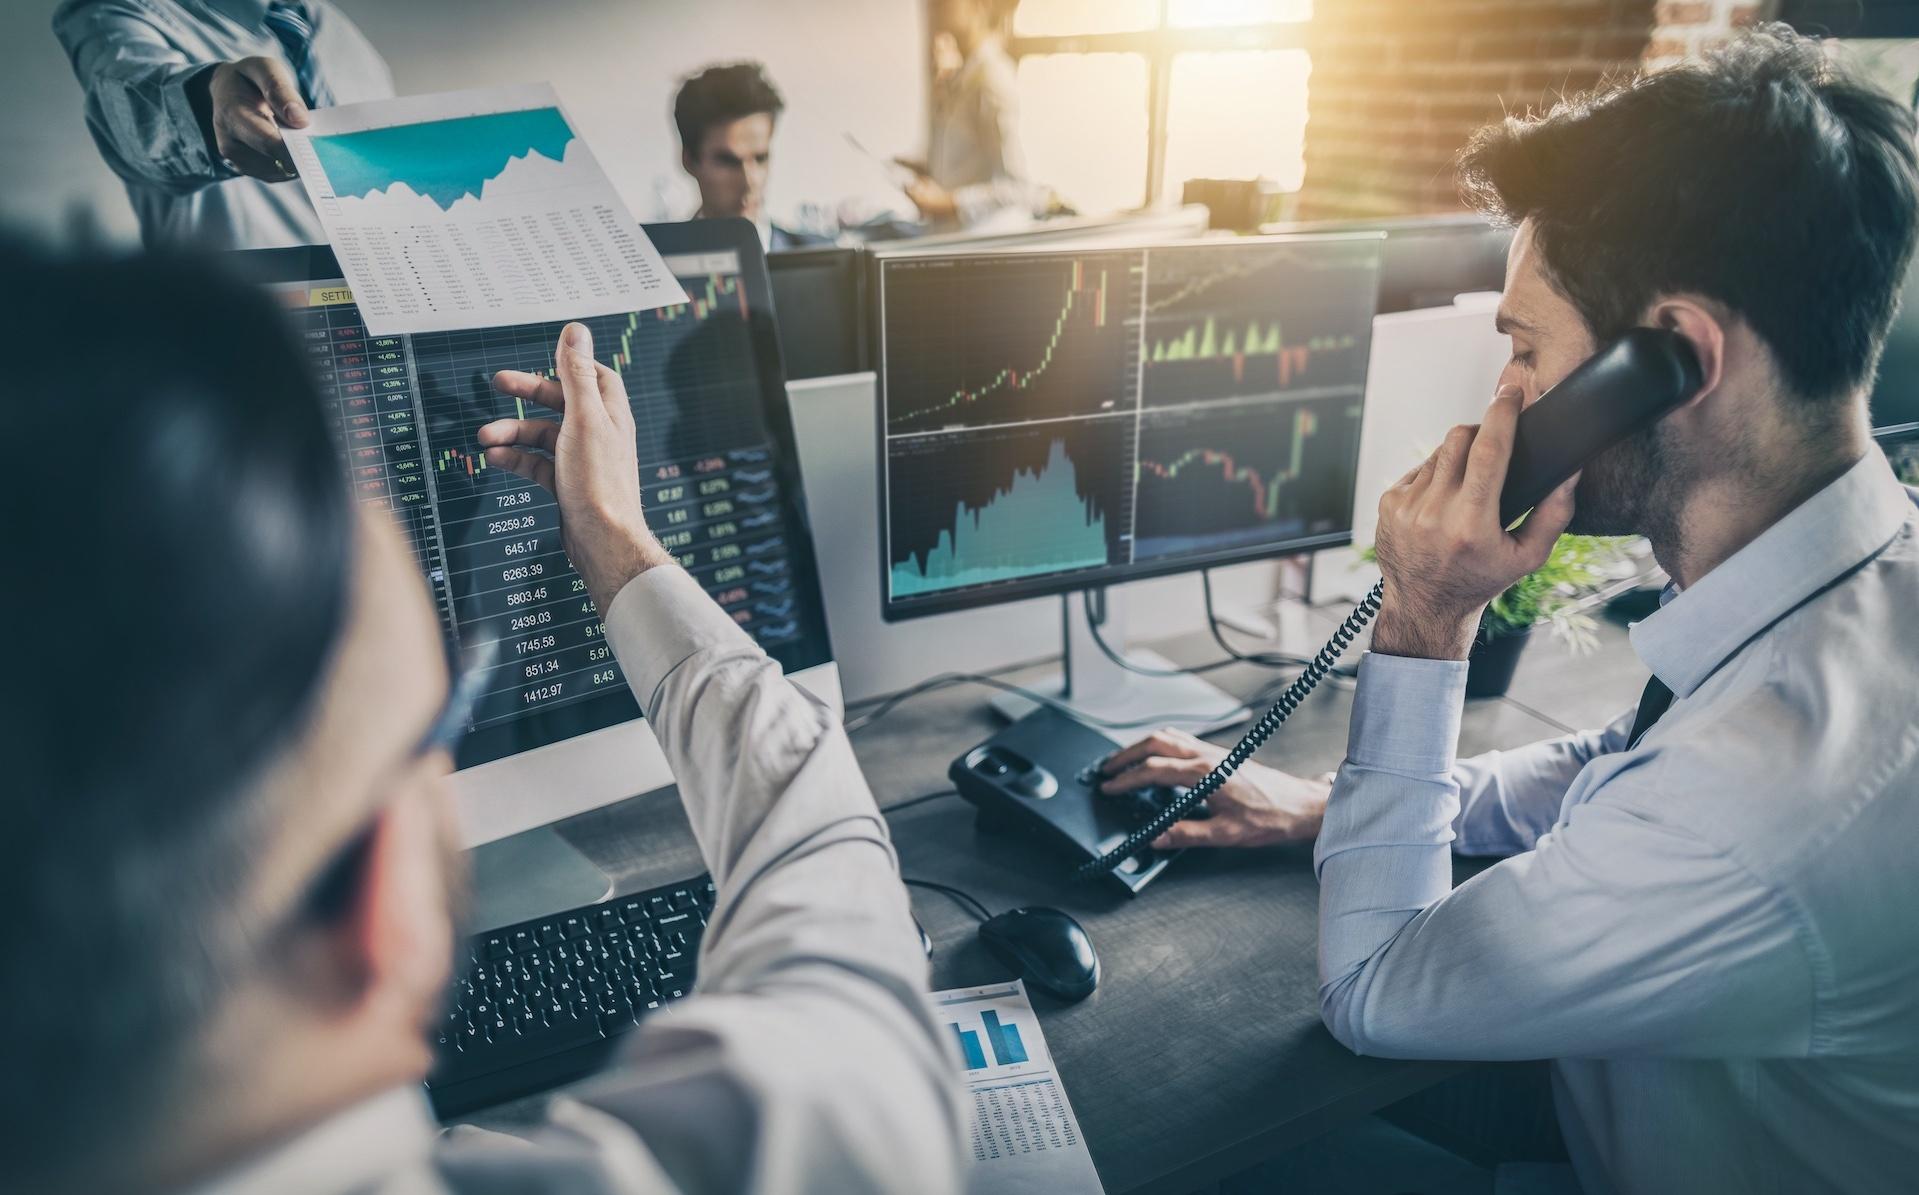 Institutional Investors, Hedge Funds, Quants, Big Banks